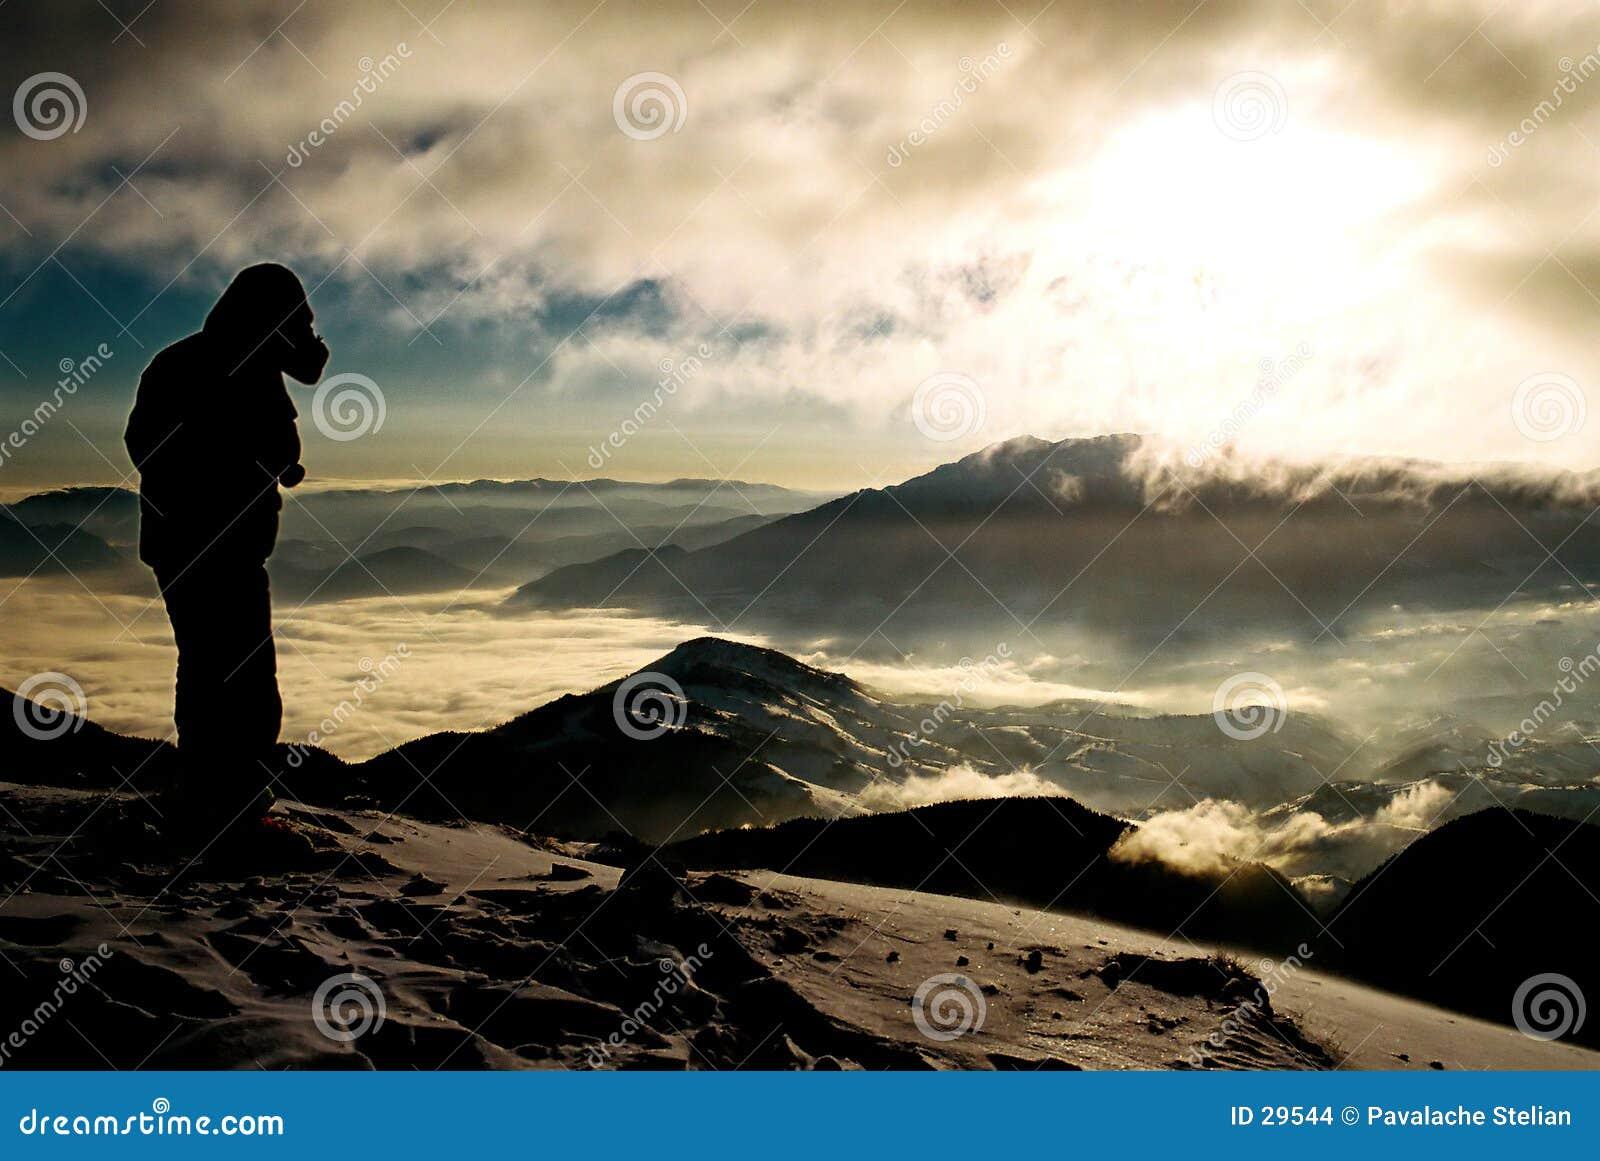 Krajobrazowa sylwetka mountain